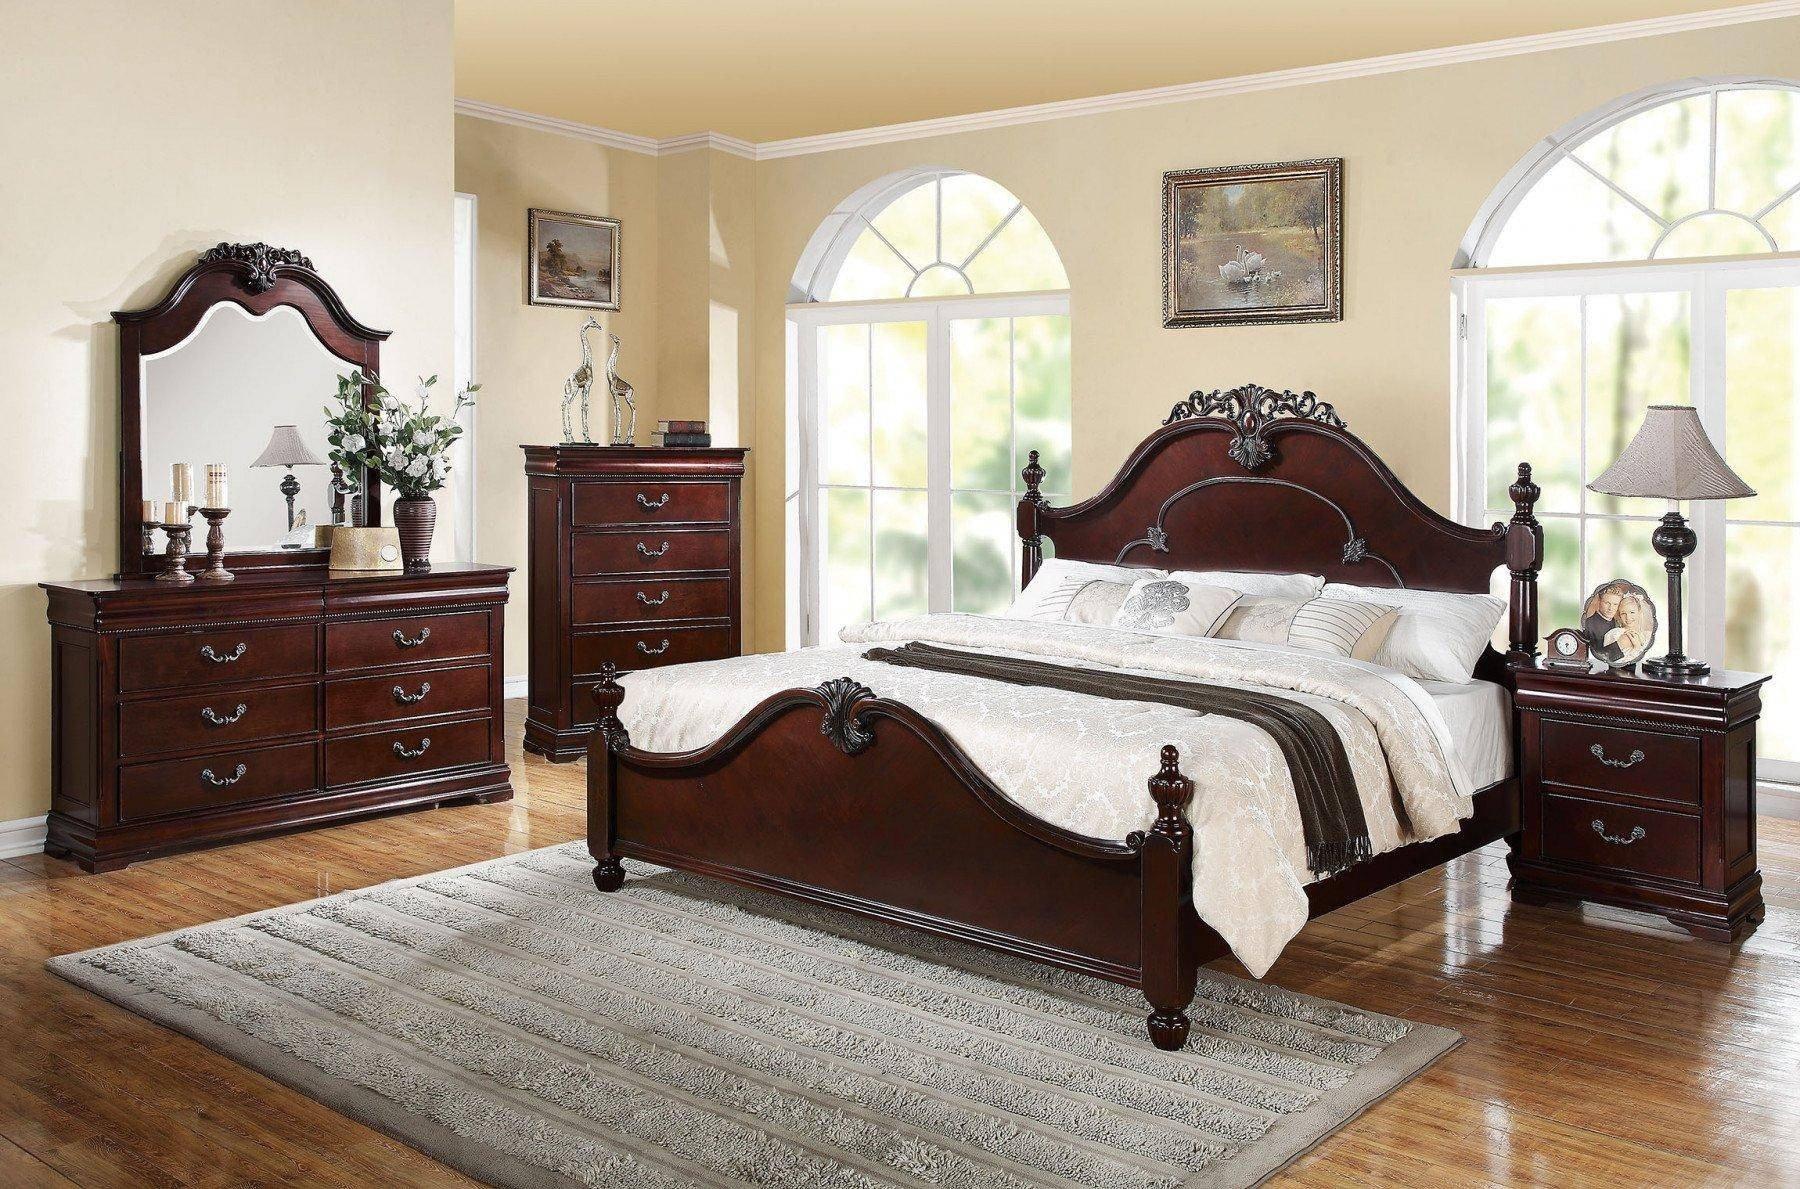 Acme Furniture Bedroom Set Beautiful Cherry Poster King Bedroom Set 5 Pcs Acme Furniture Ek